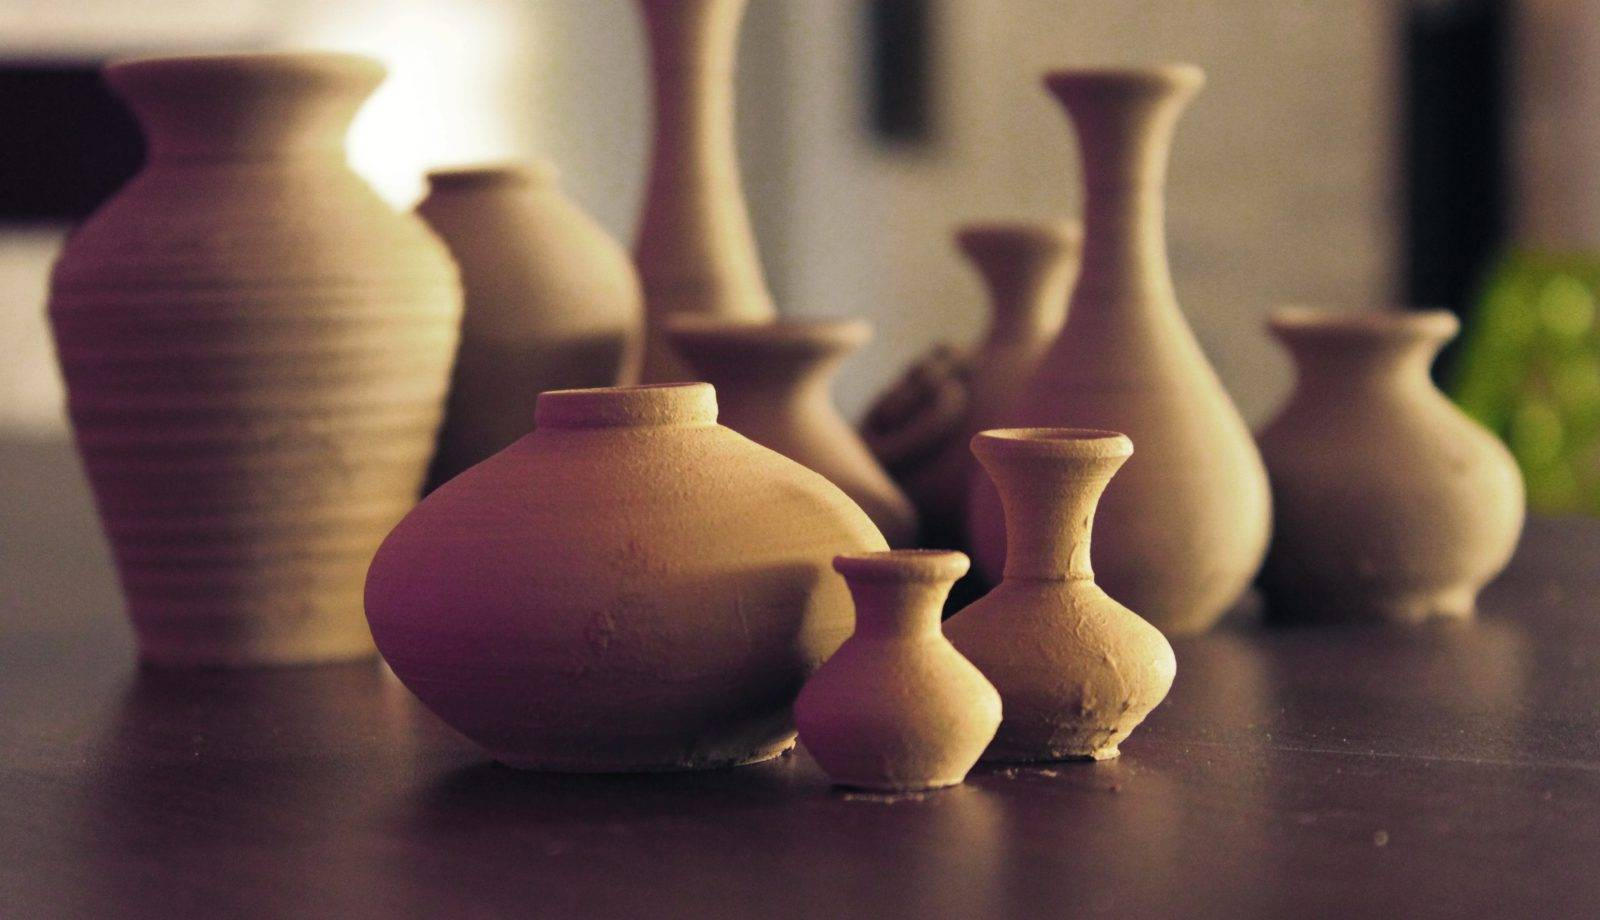 Modern Home Decoration using Handicrafts